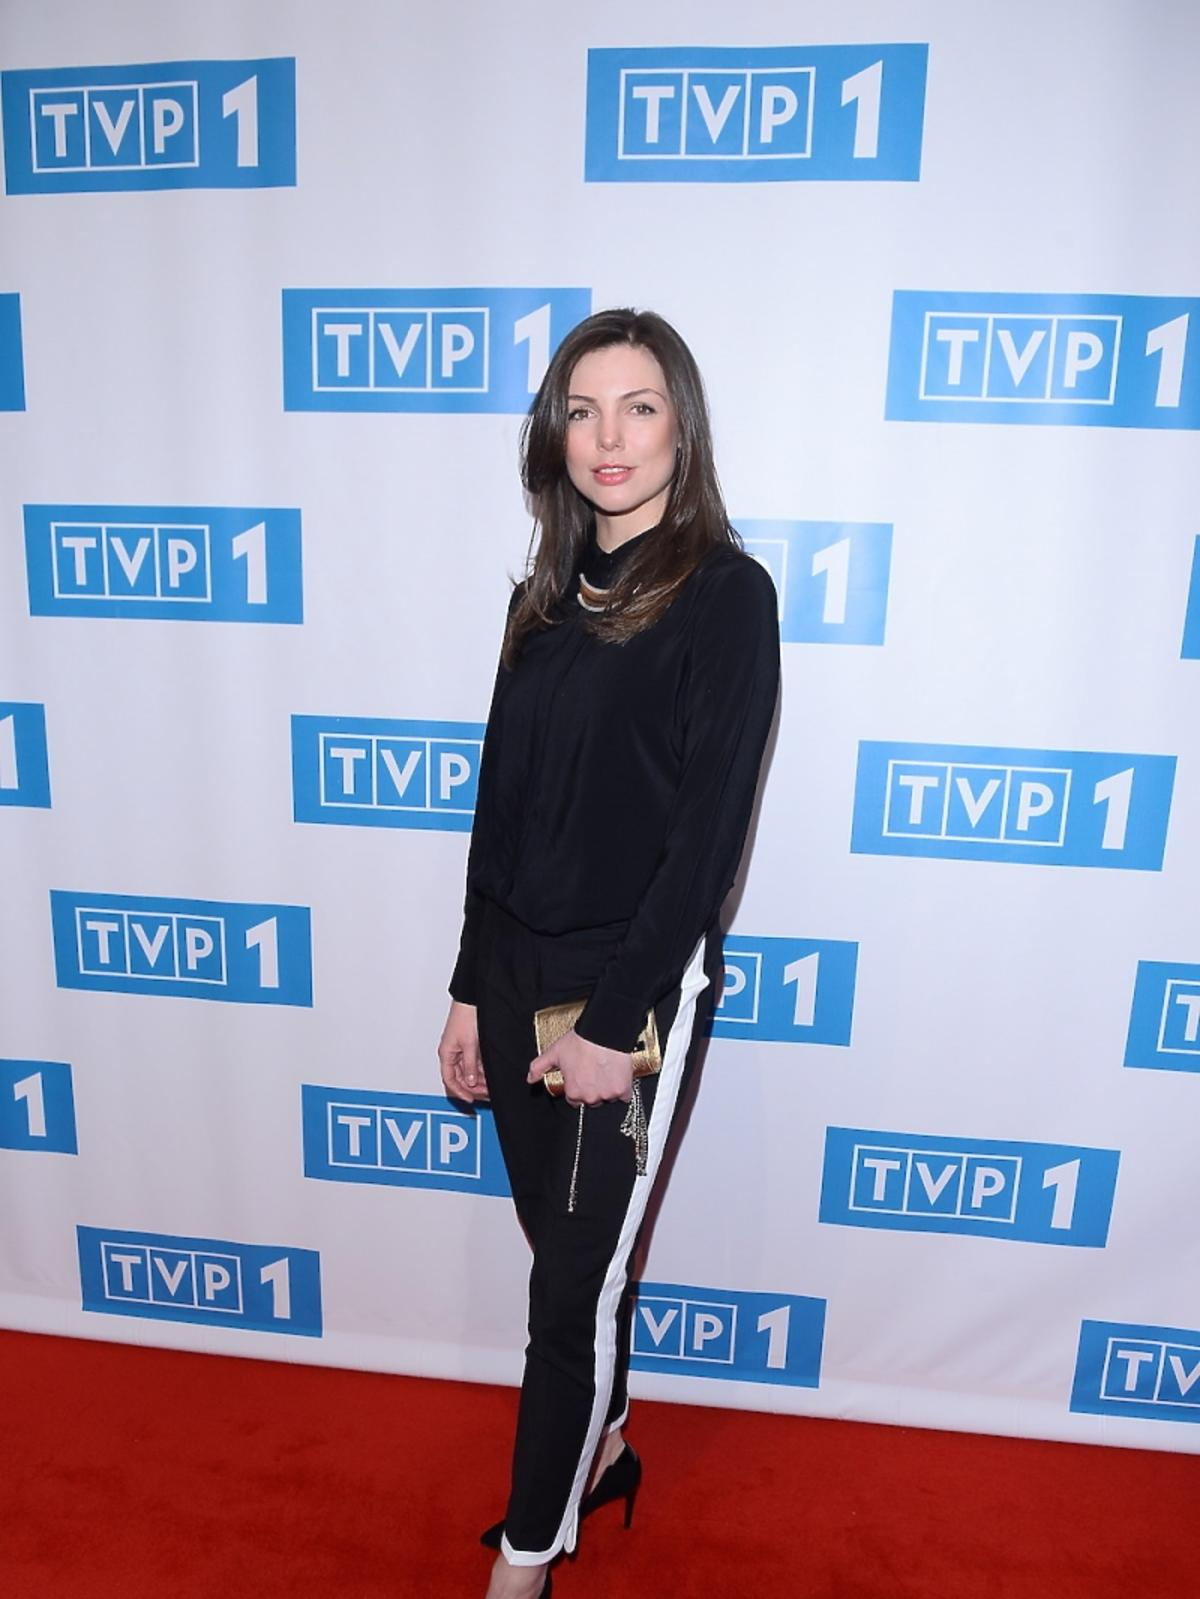 Karolina Gorczyca na ramówce TVP 1